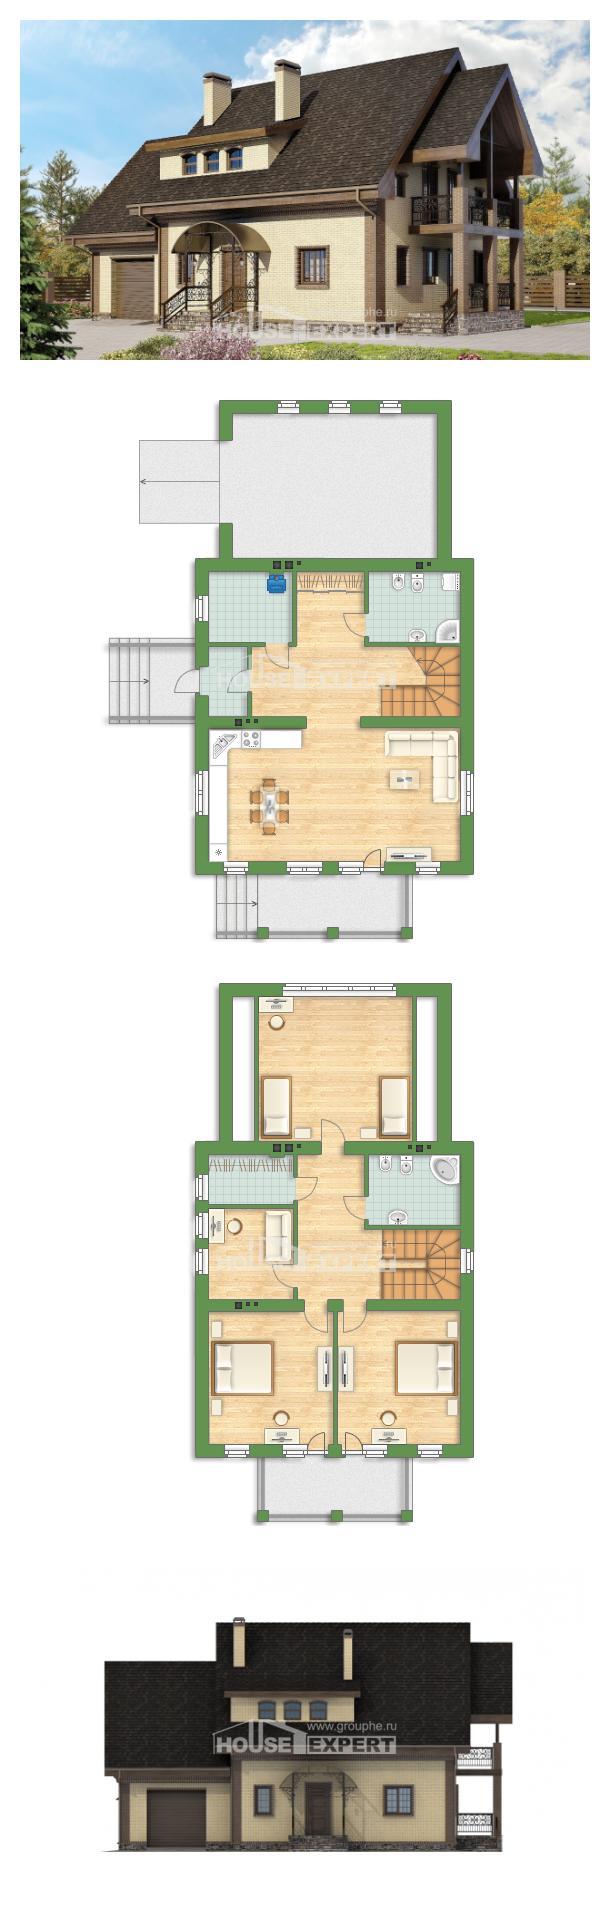 Проект дома 185-003-Л   House Expert